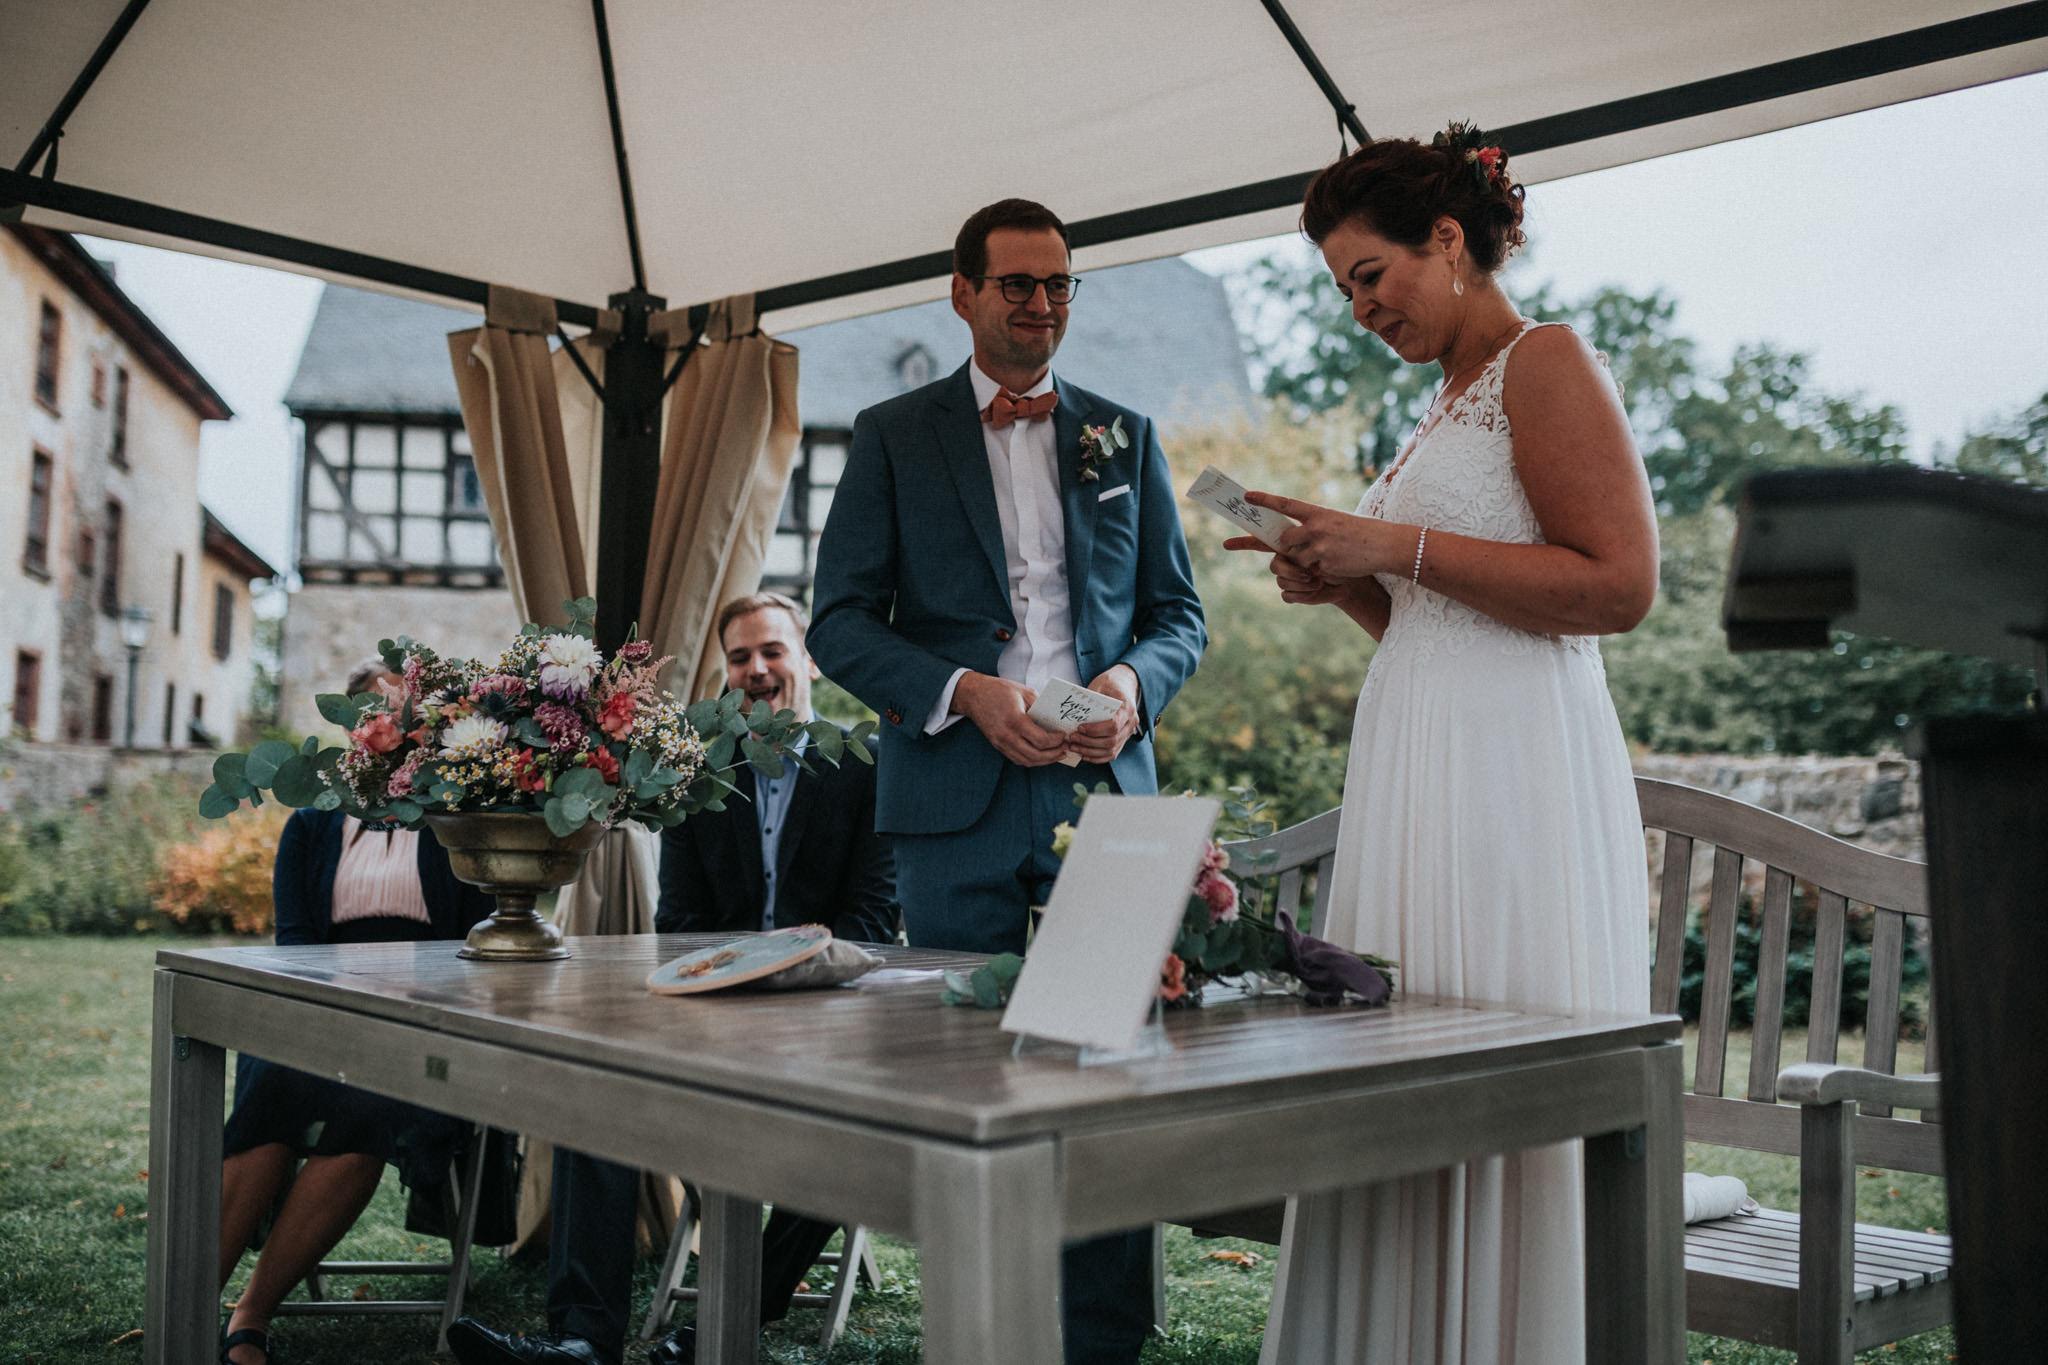 Hochzeitsfotograf-Homberg-35.jpg